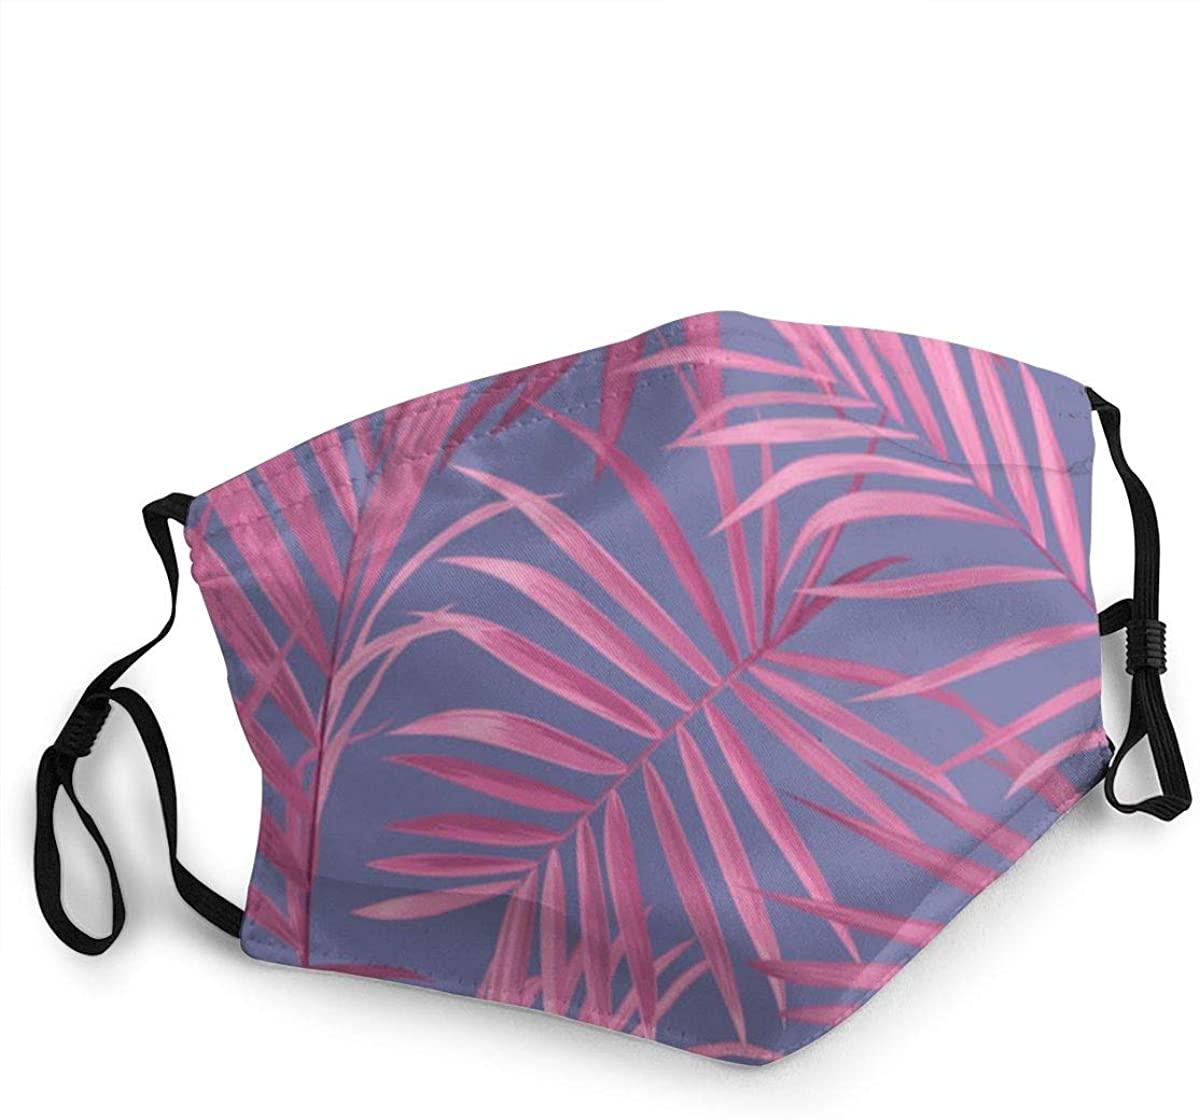 MARTHLORES Fashion Protective, Reusable Cotton Fabric Pink Palm Leaves On Purple Unisex Cotton, Washable,Adjustable, Reusable.